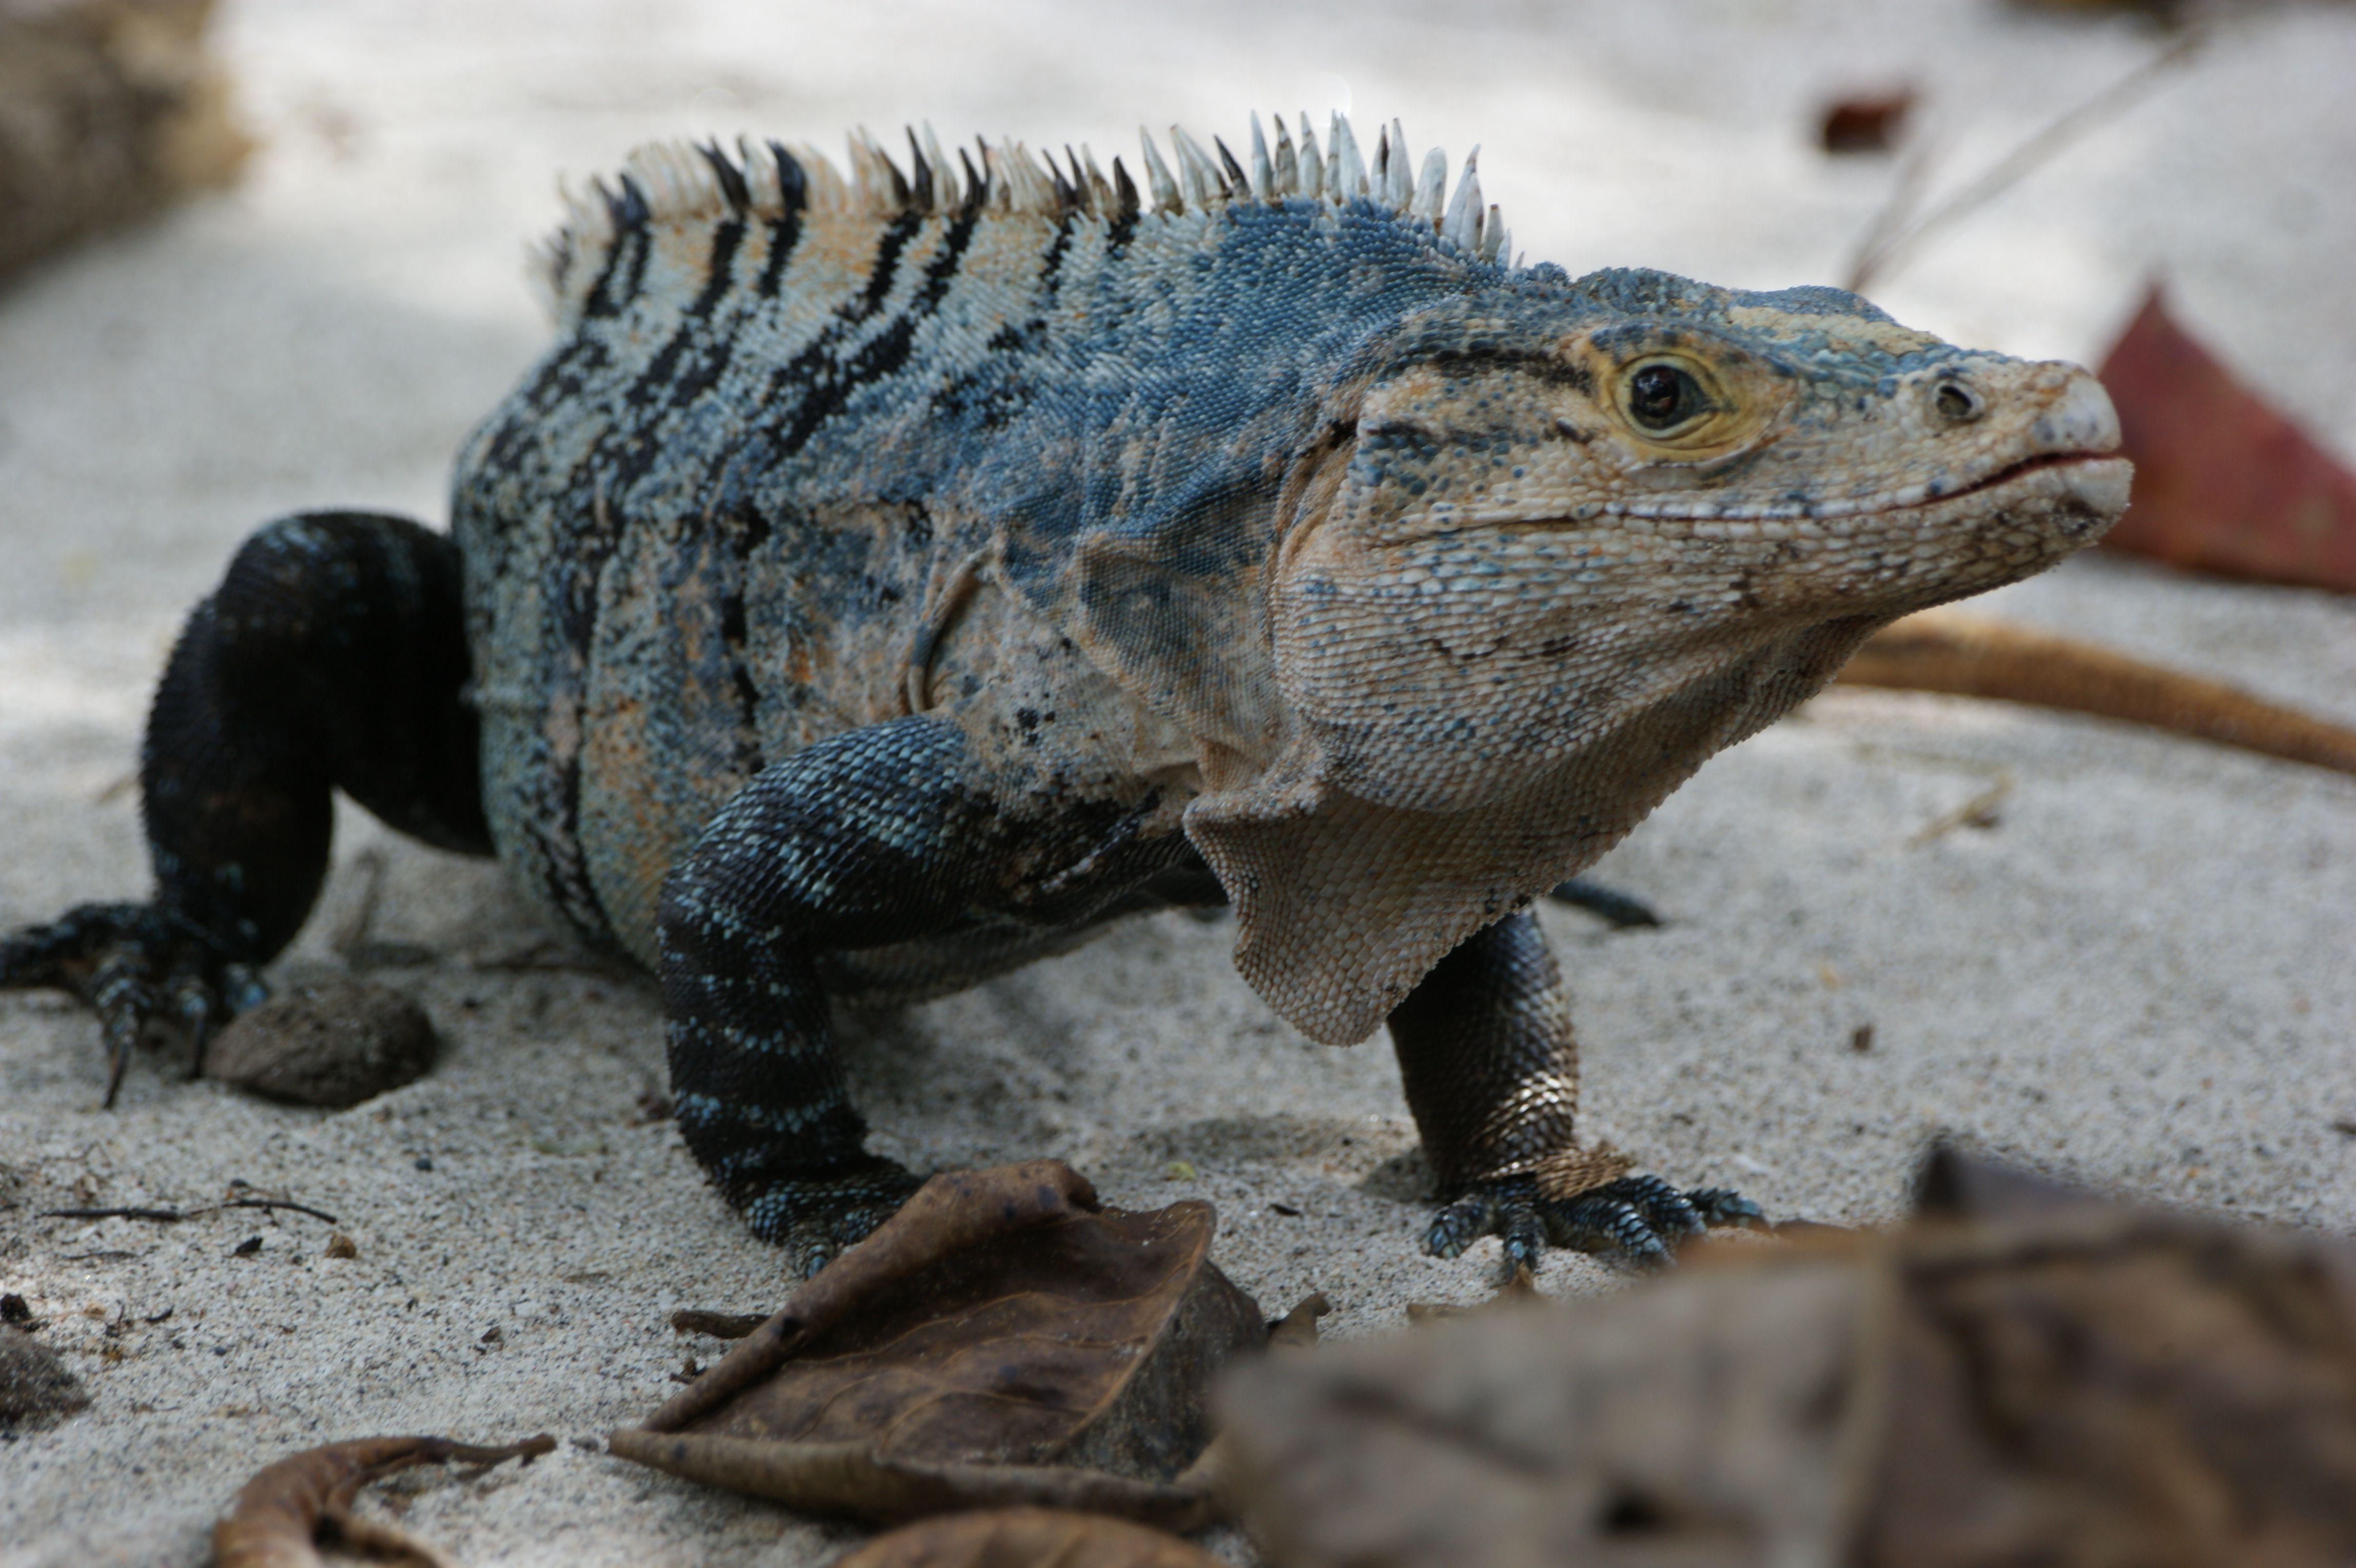 Black Iguana Reptiles and amphibians, Lizard species